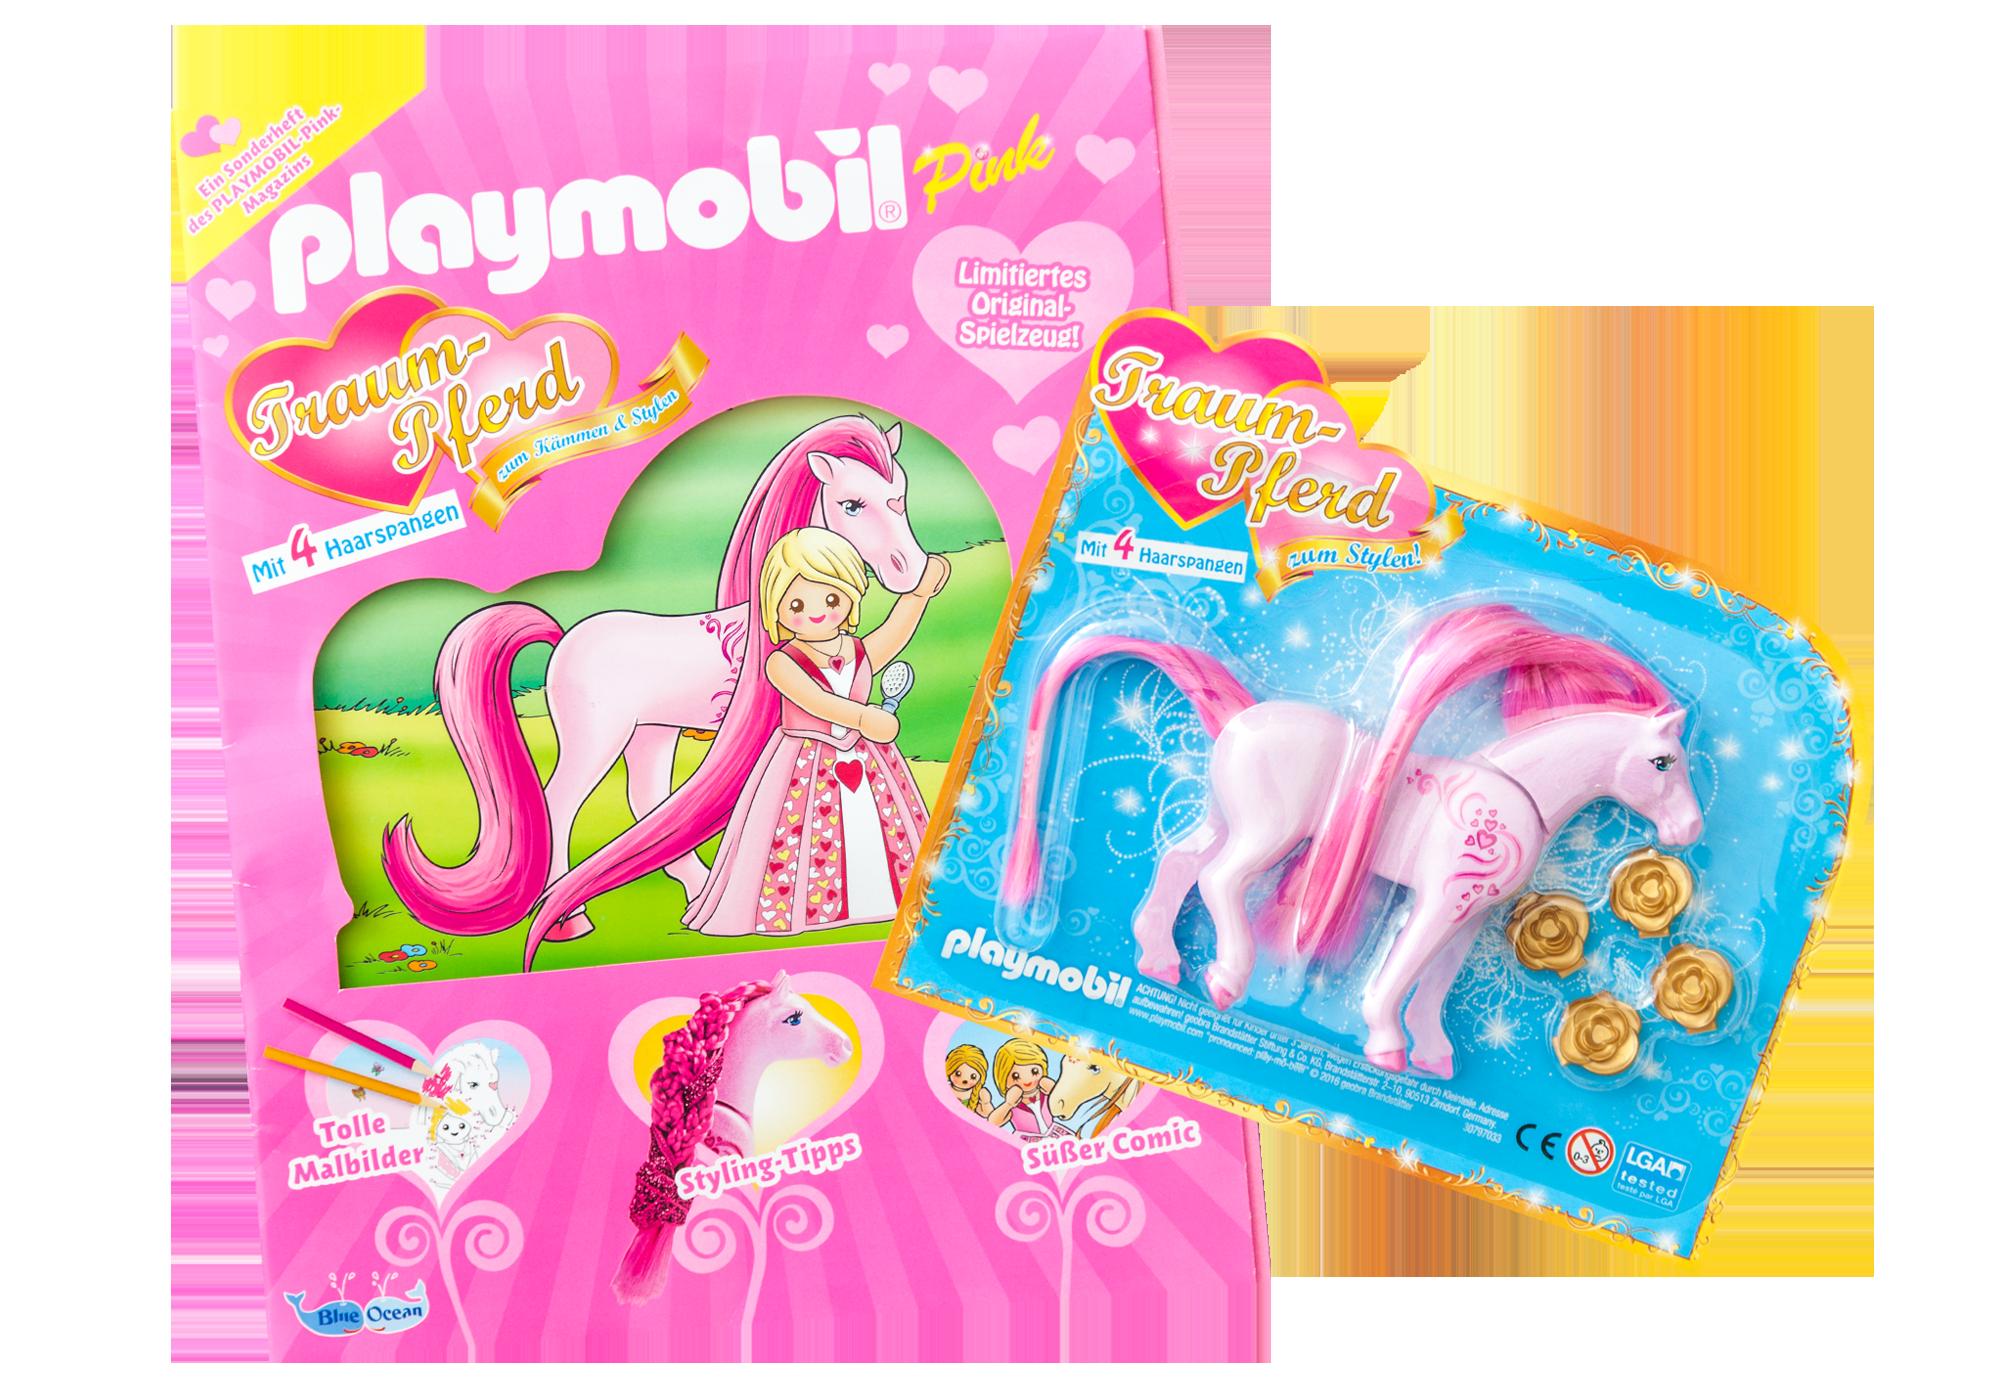 http://media.playmobil.com/i/playmobil/80576_product_detail